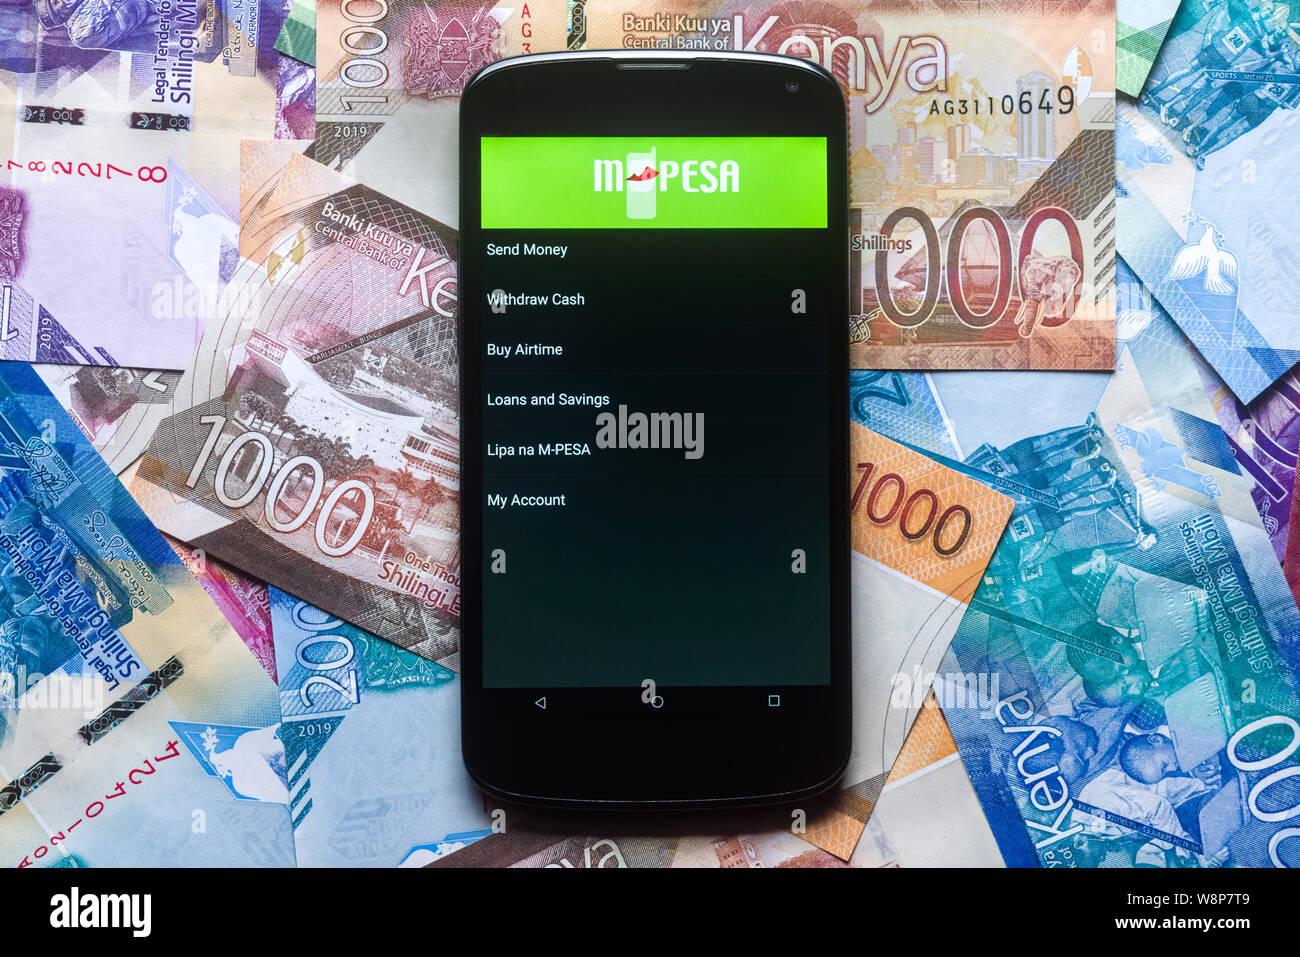 Safaricom M-Pesa fintech microfinance money transaction service on phone with new Kenyan Shilling bank notes background Stock Photo